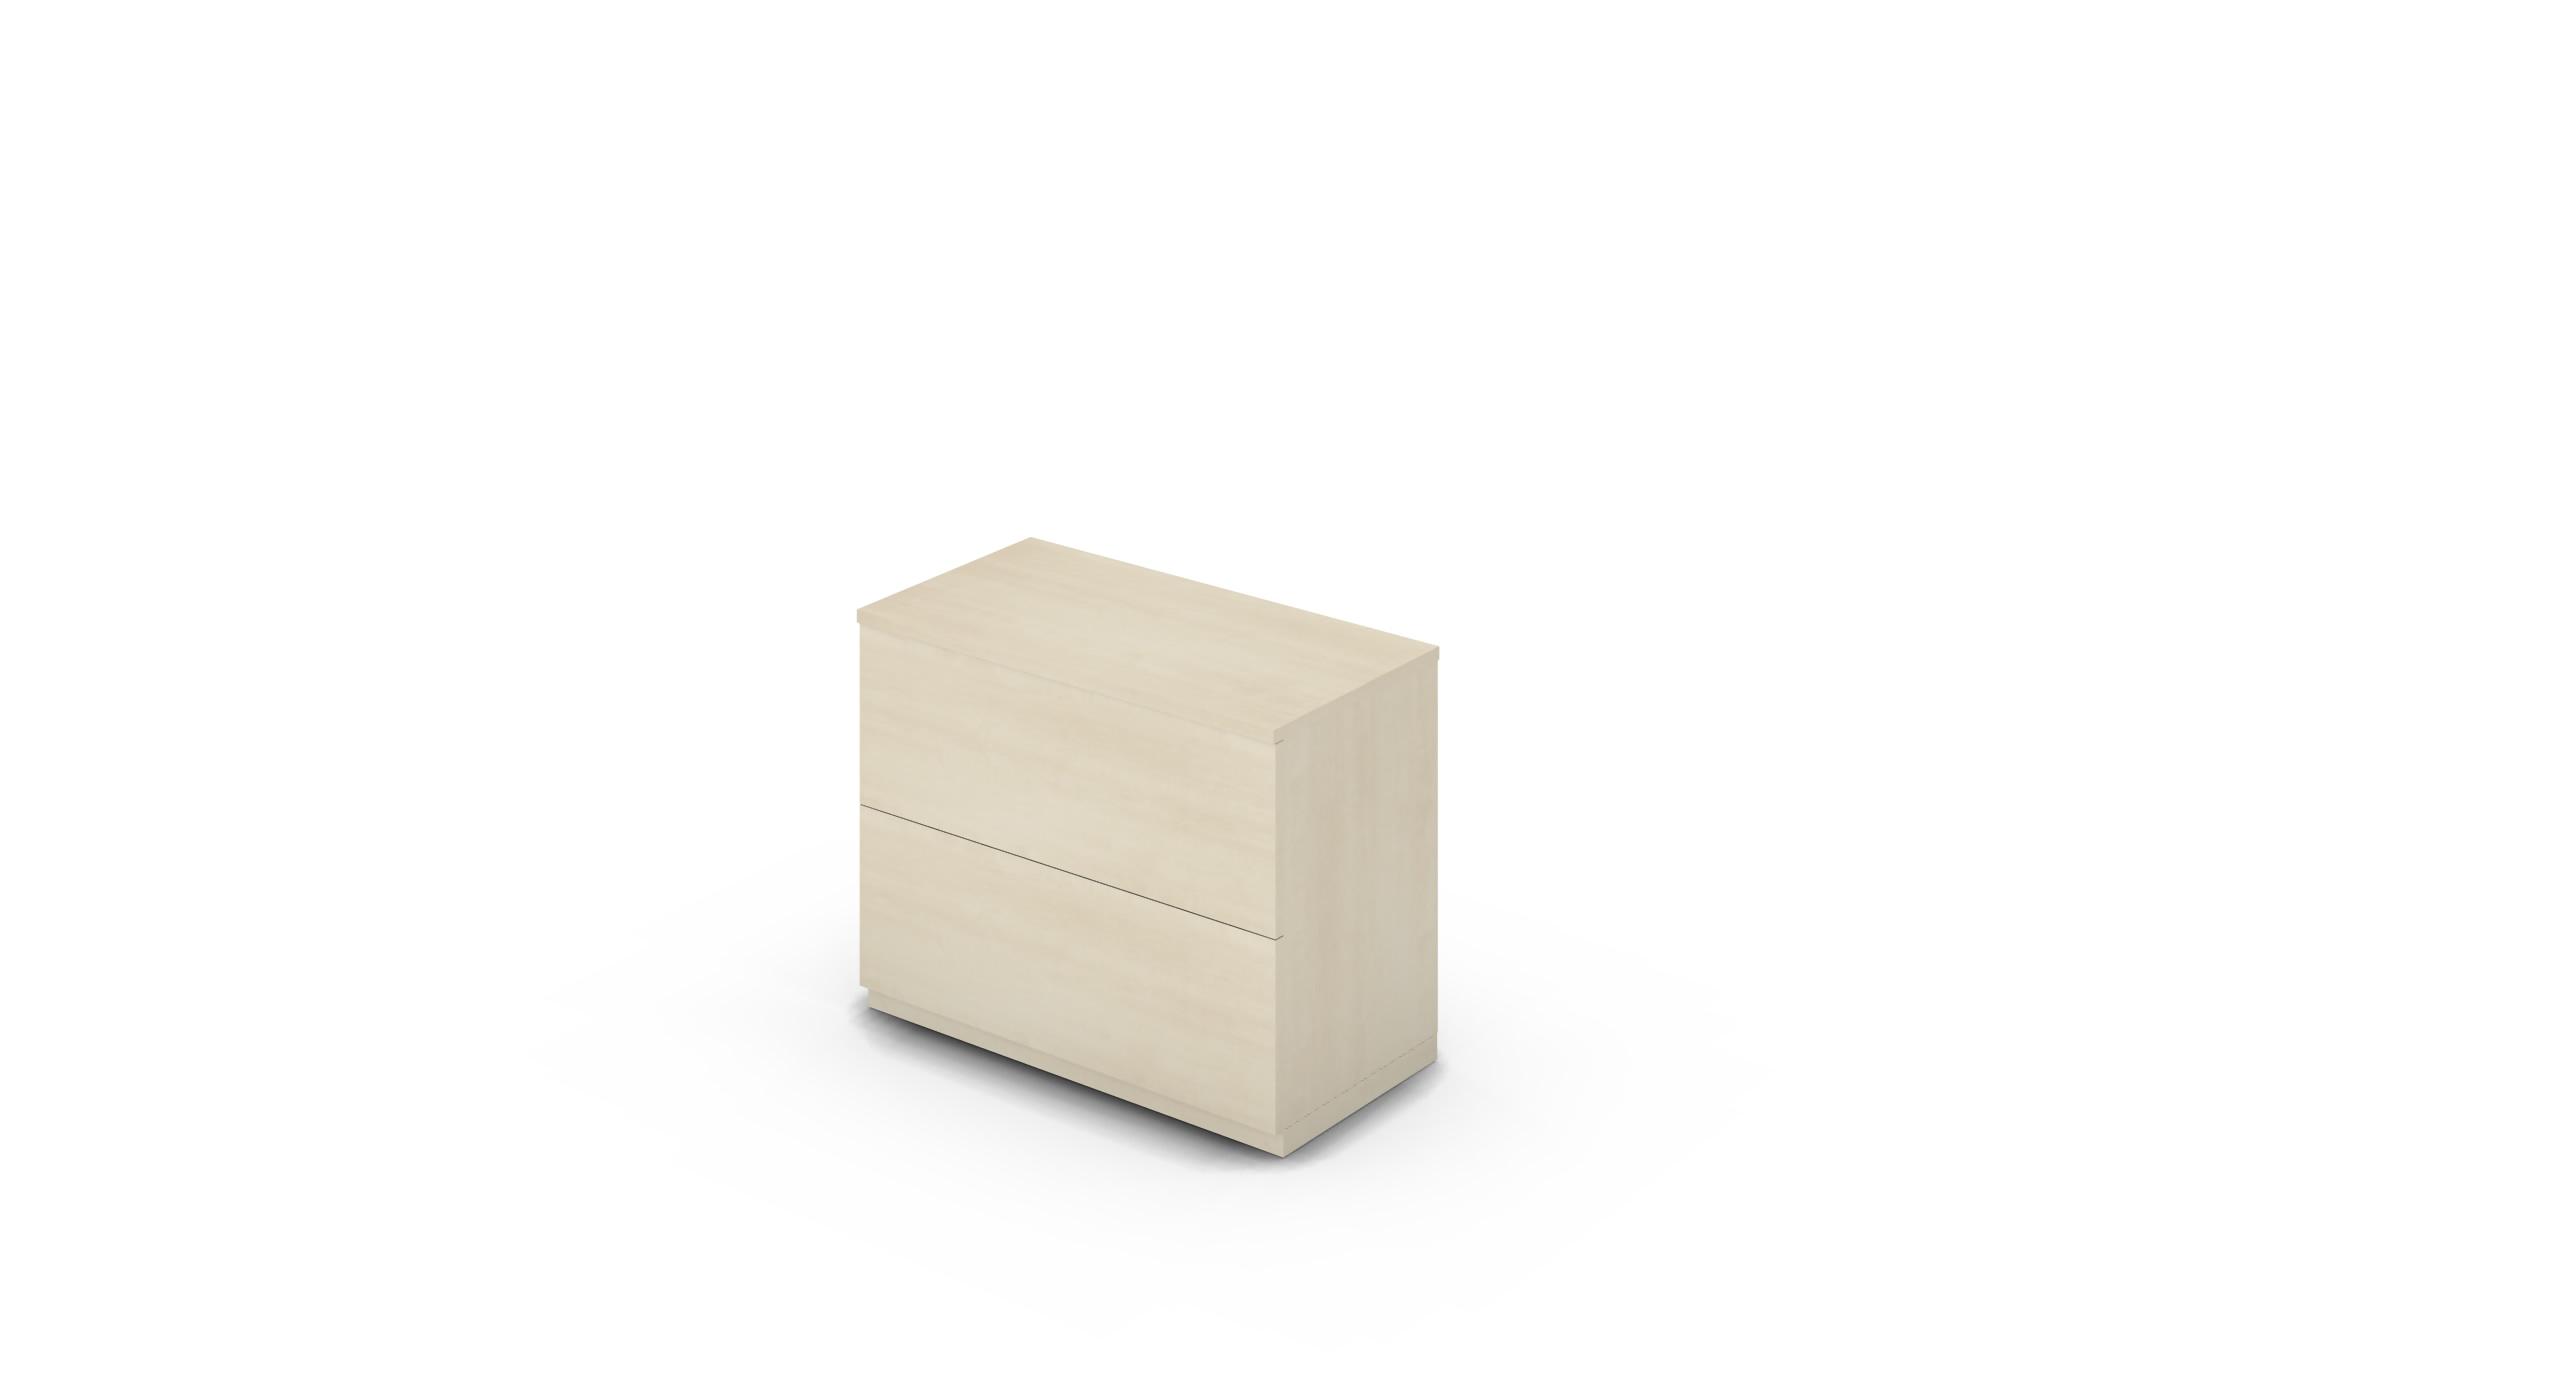 Cabinet_900x450x775_DR_Maple_Push_NoCylinder